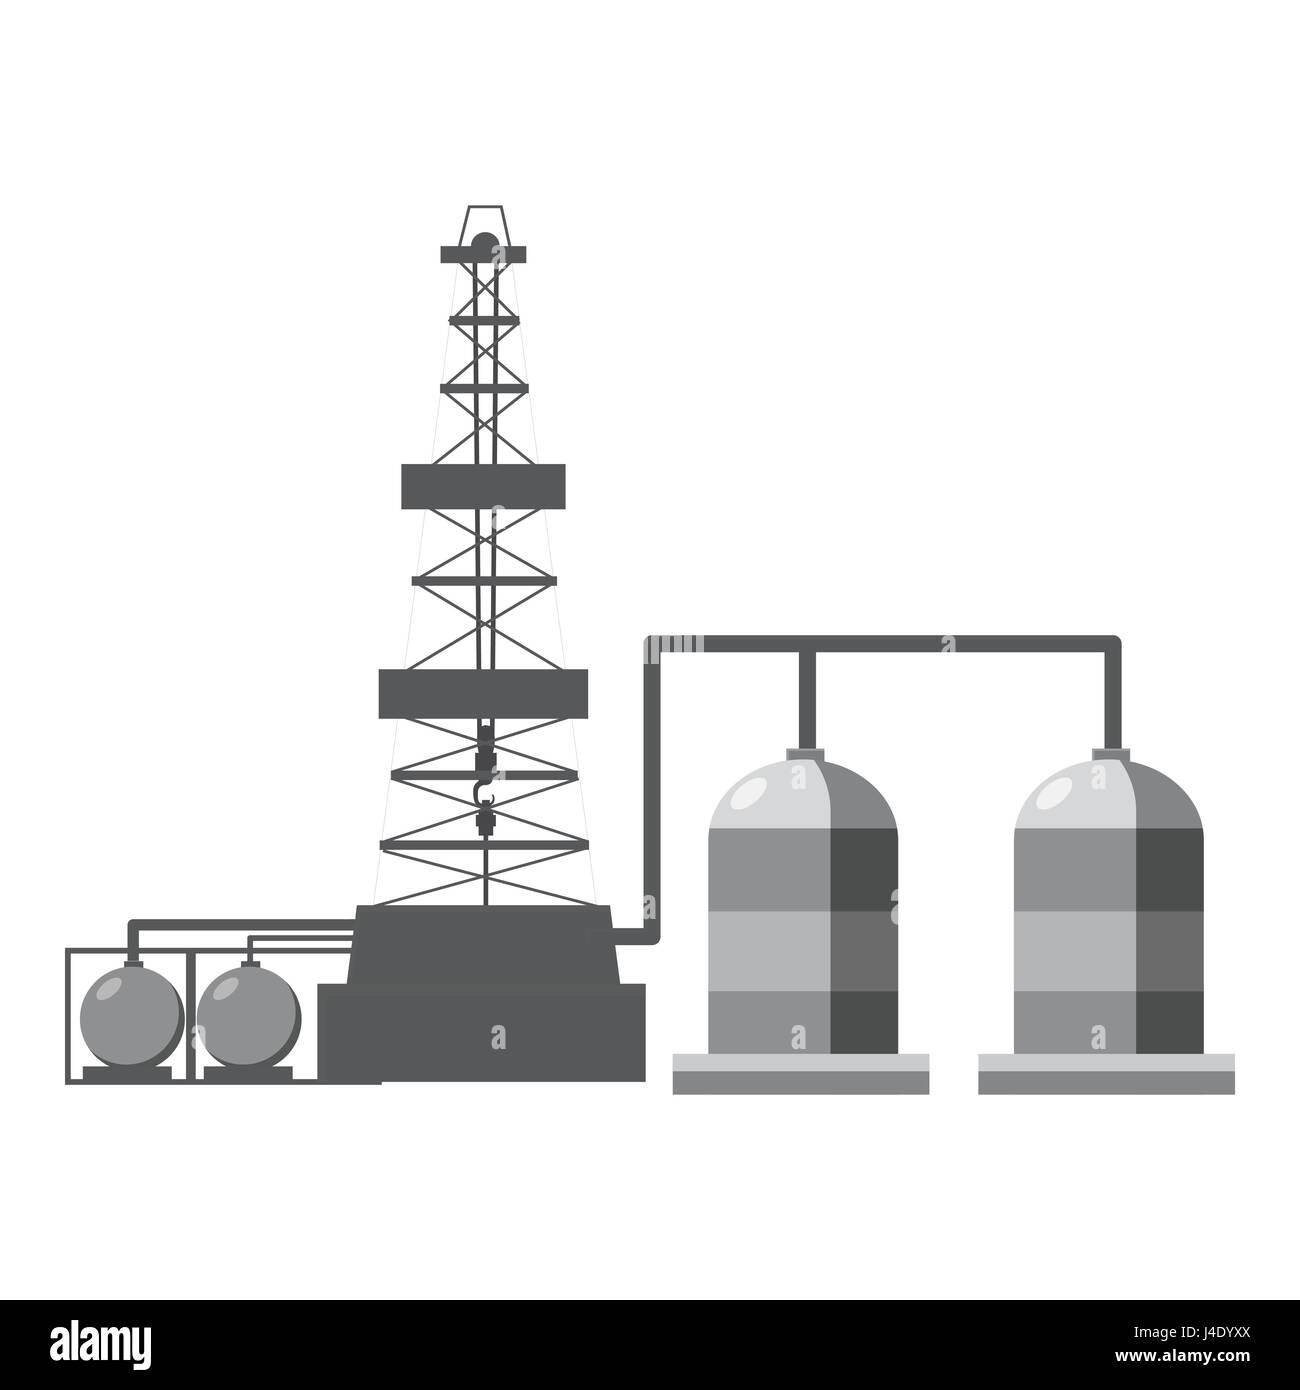 Welding Equipment Cartoon Stock Photos Diagram Refinery Icon Gray Monochrome Style Image